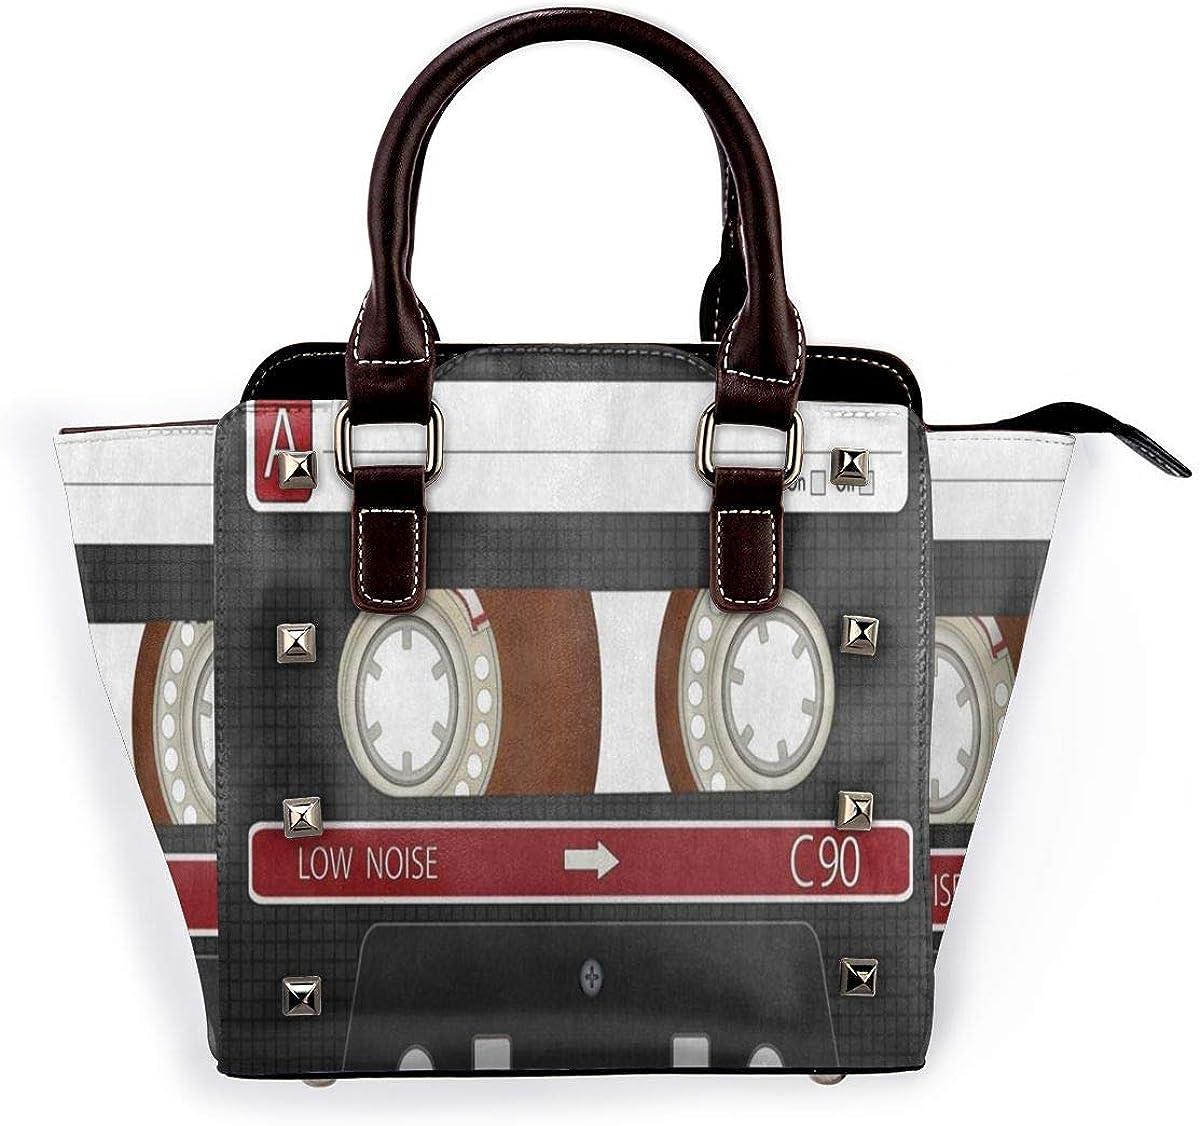 Tote Bag Audio Cassette Tape Music Shoulder Bag 3d Printed Non-Fading Handbags WomenS Waterproof Handle Bag Durable Multi-Functional Crossbody Travel Bag With Strap Zipper